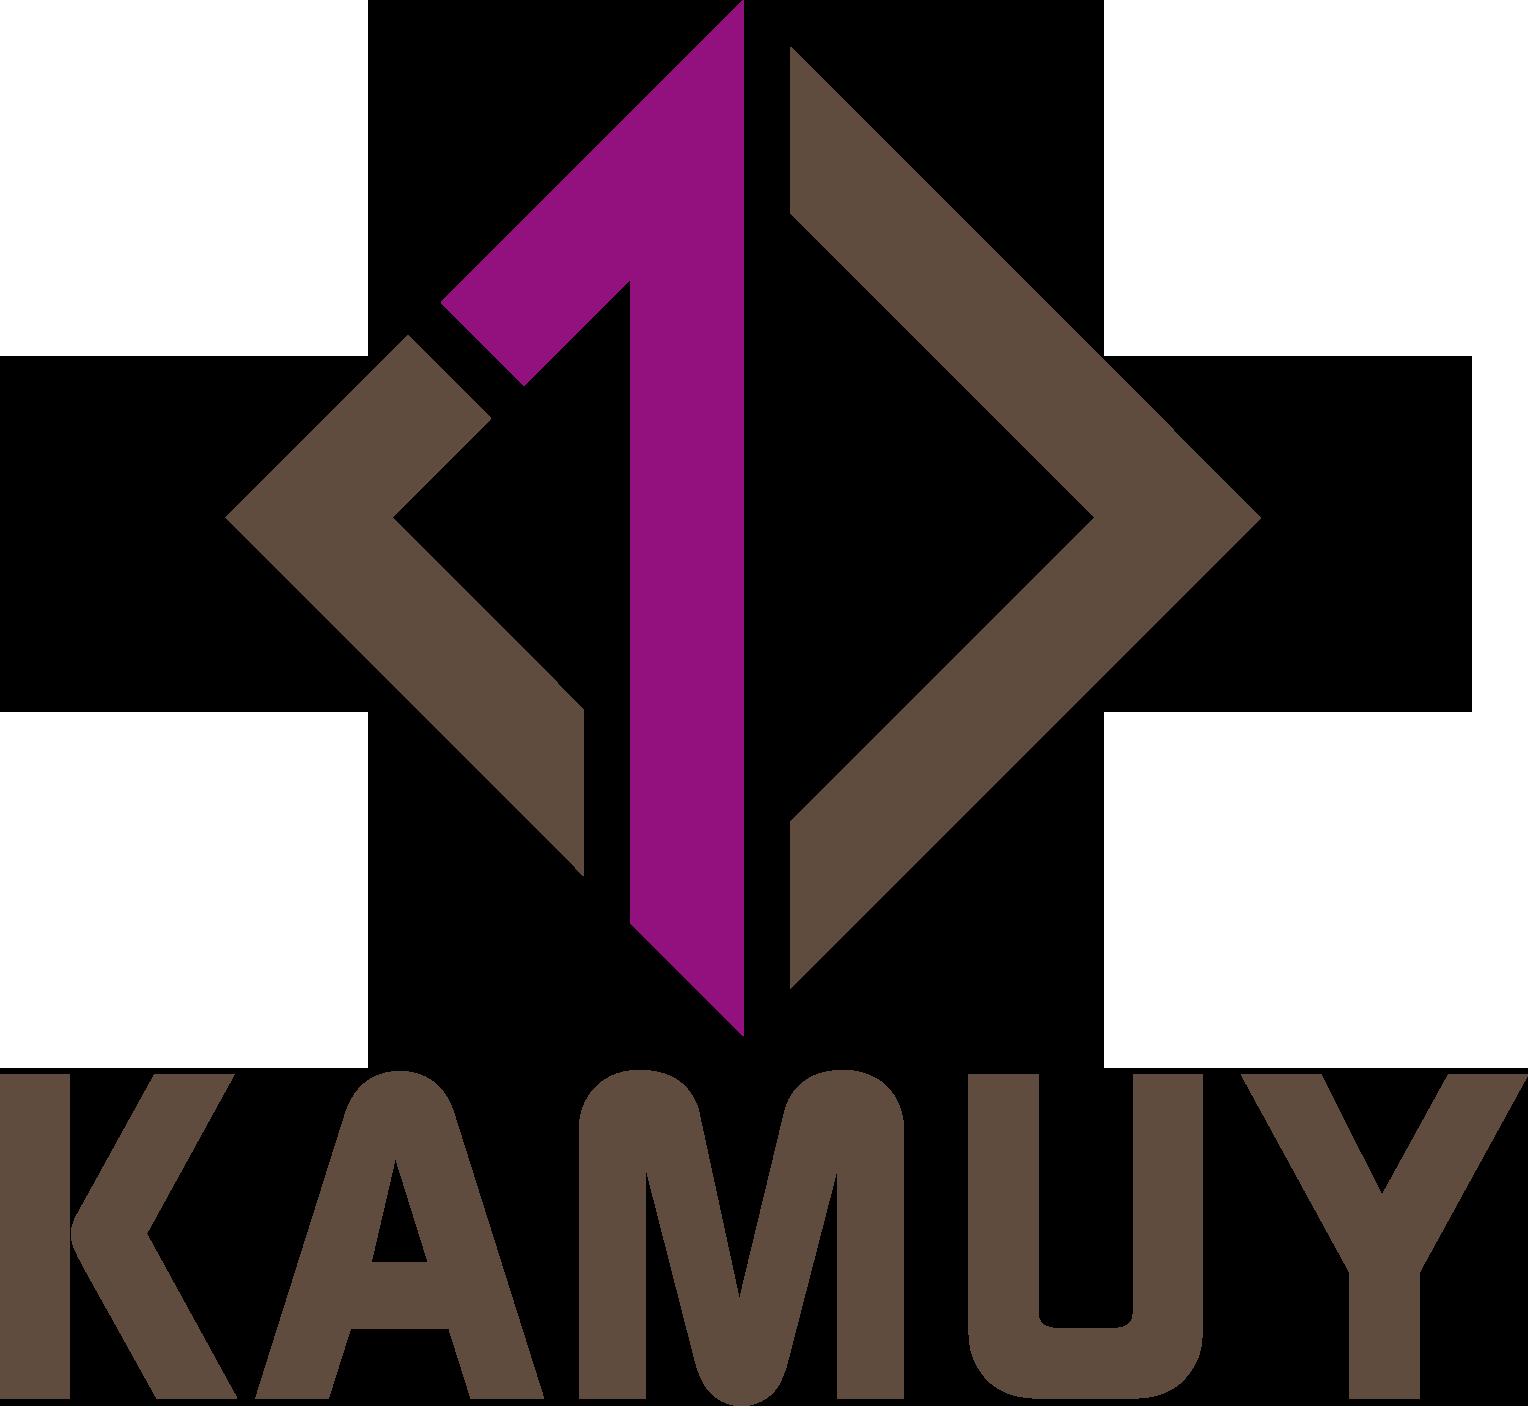 KAMUY